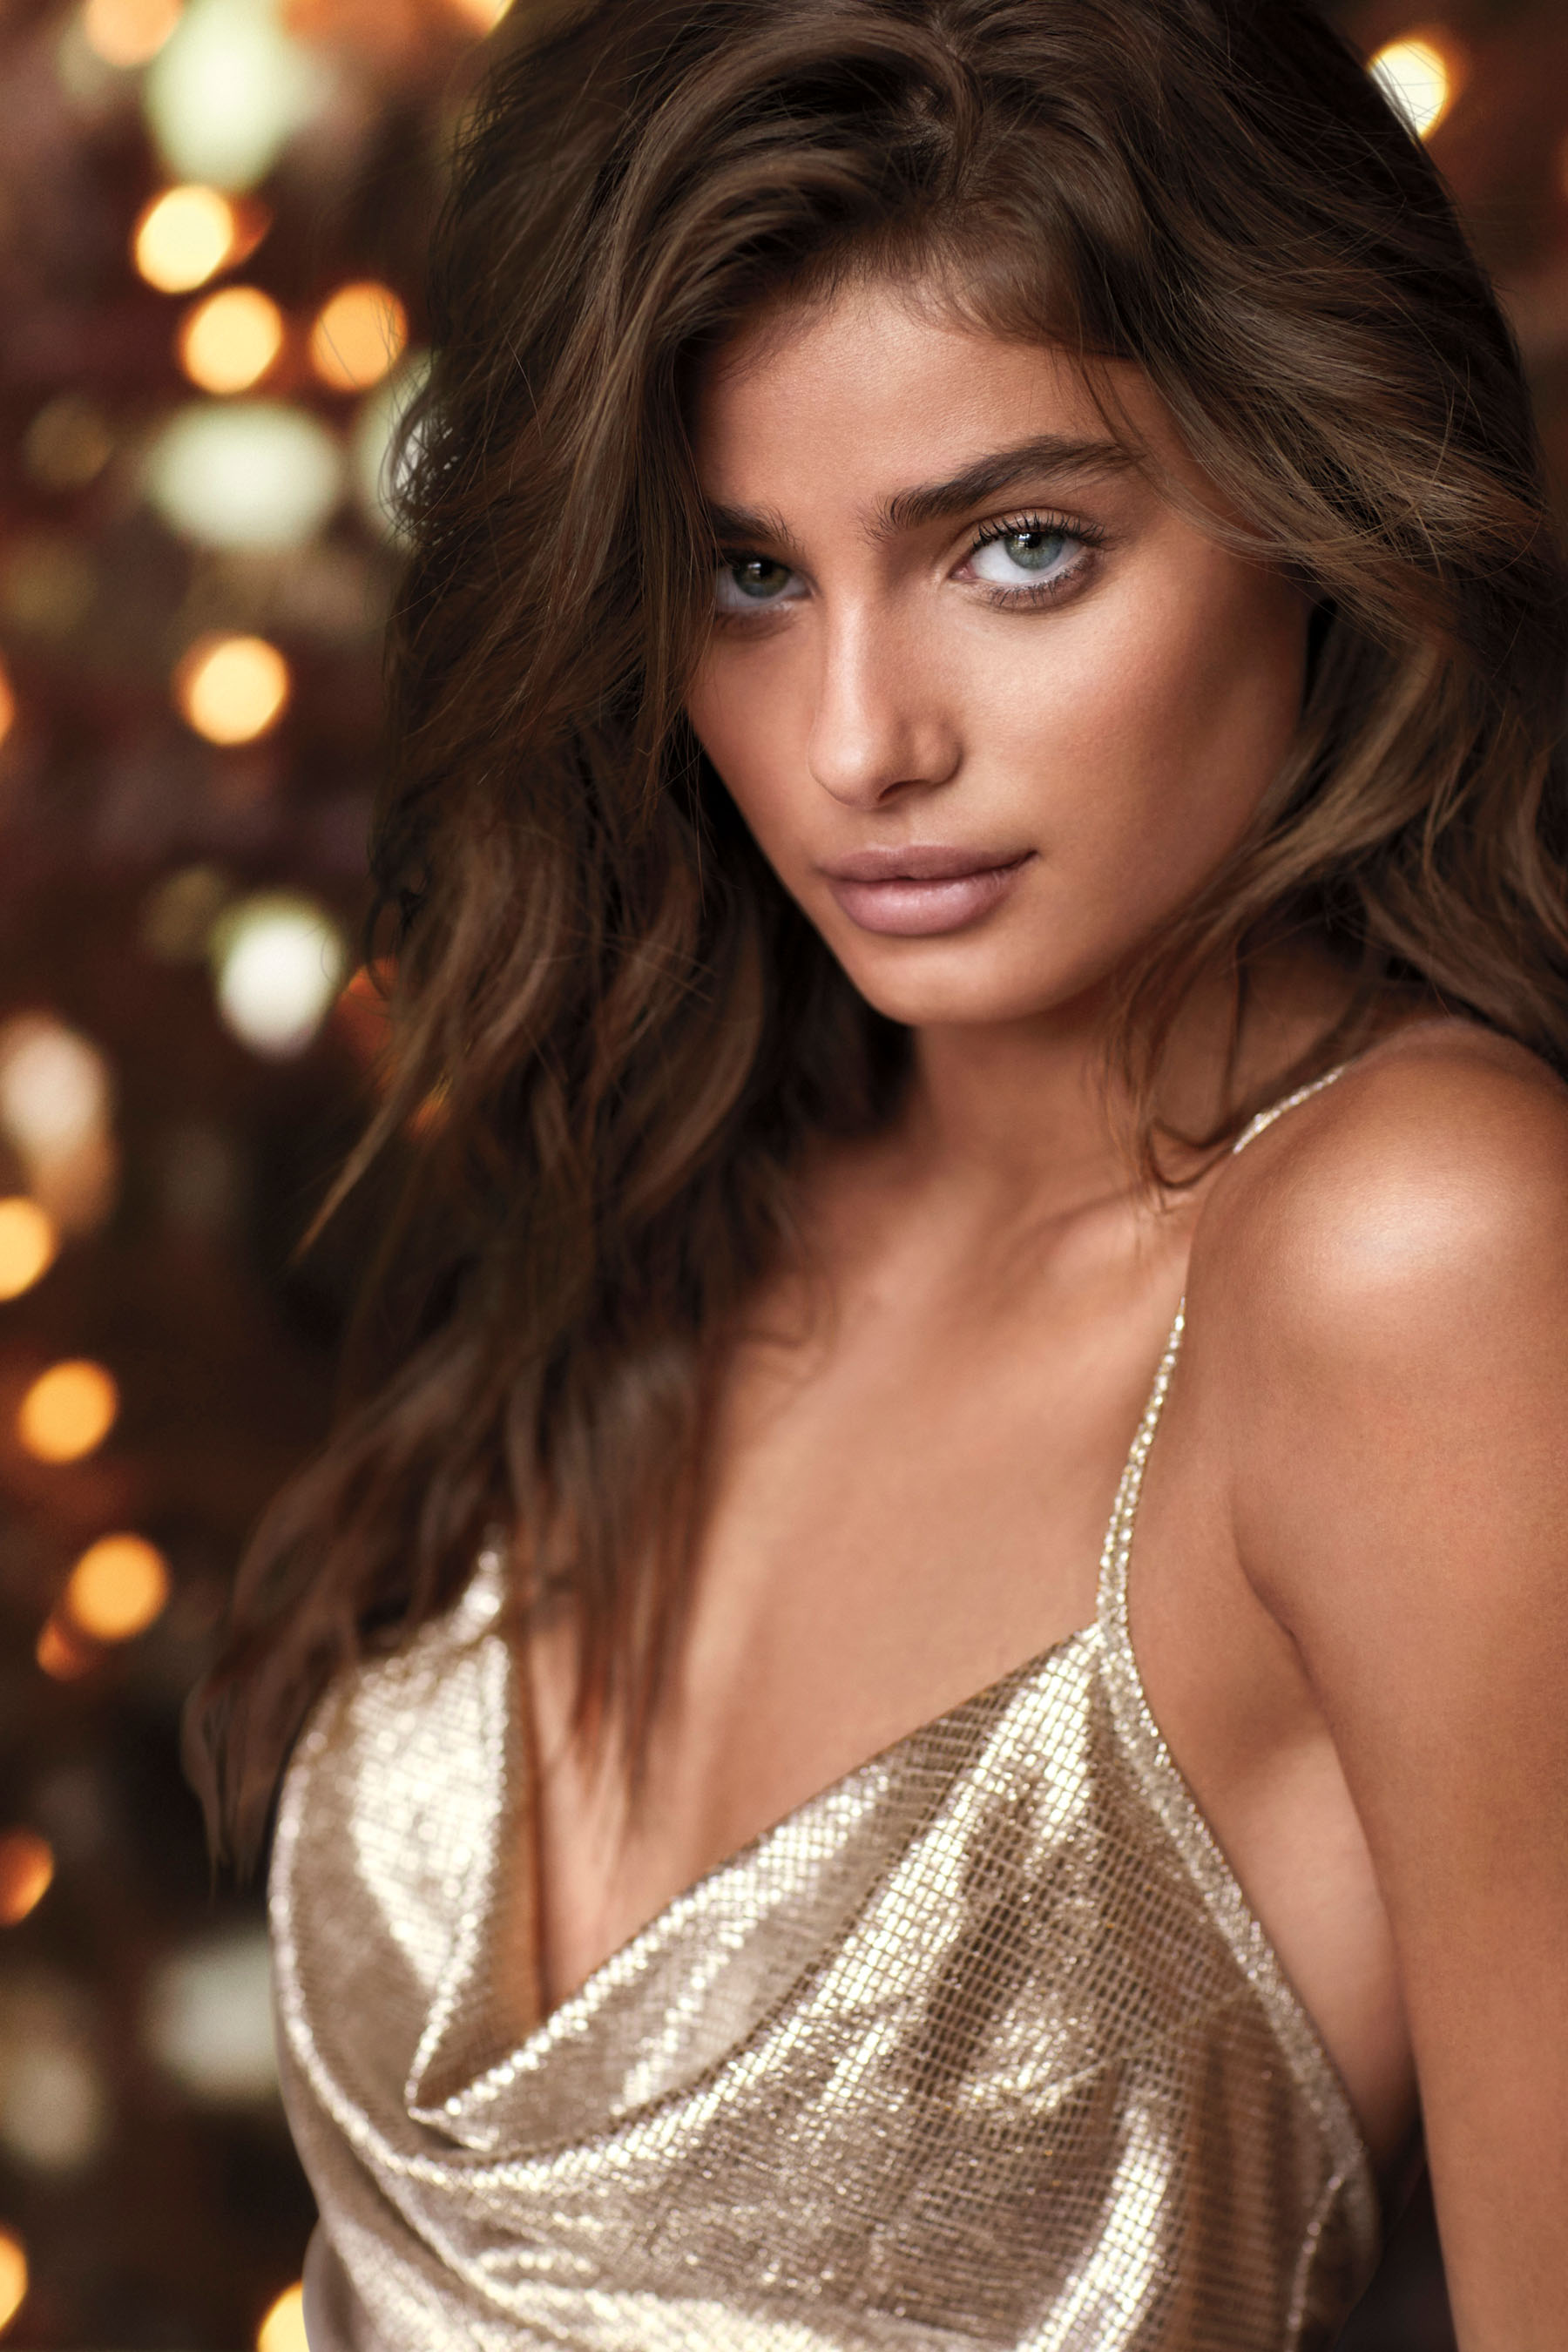 Victorias-Secret-holiday-2017-ad-campaign-the-impression-10